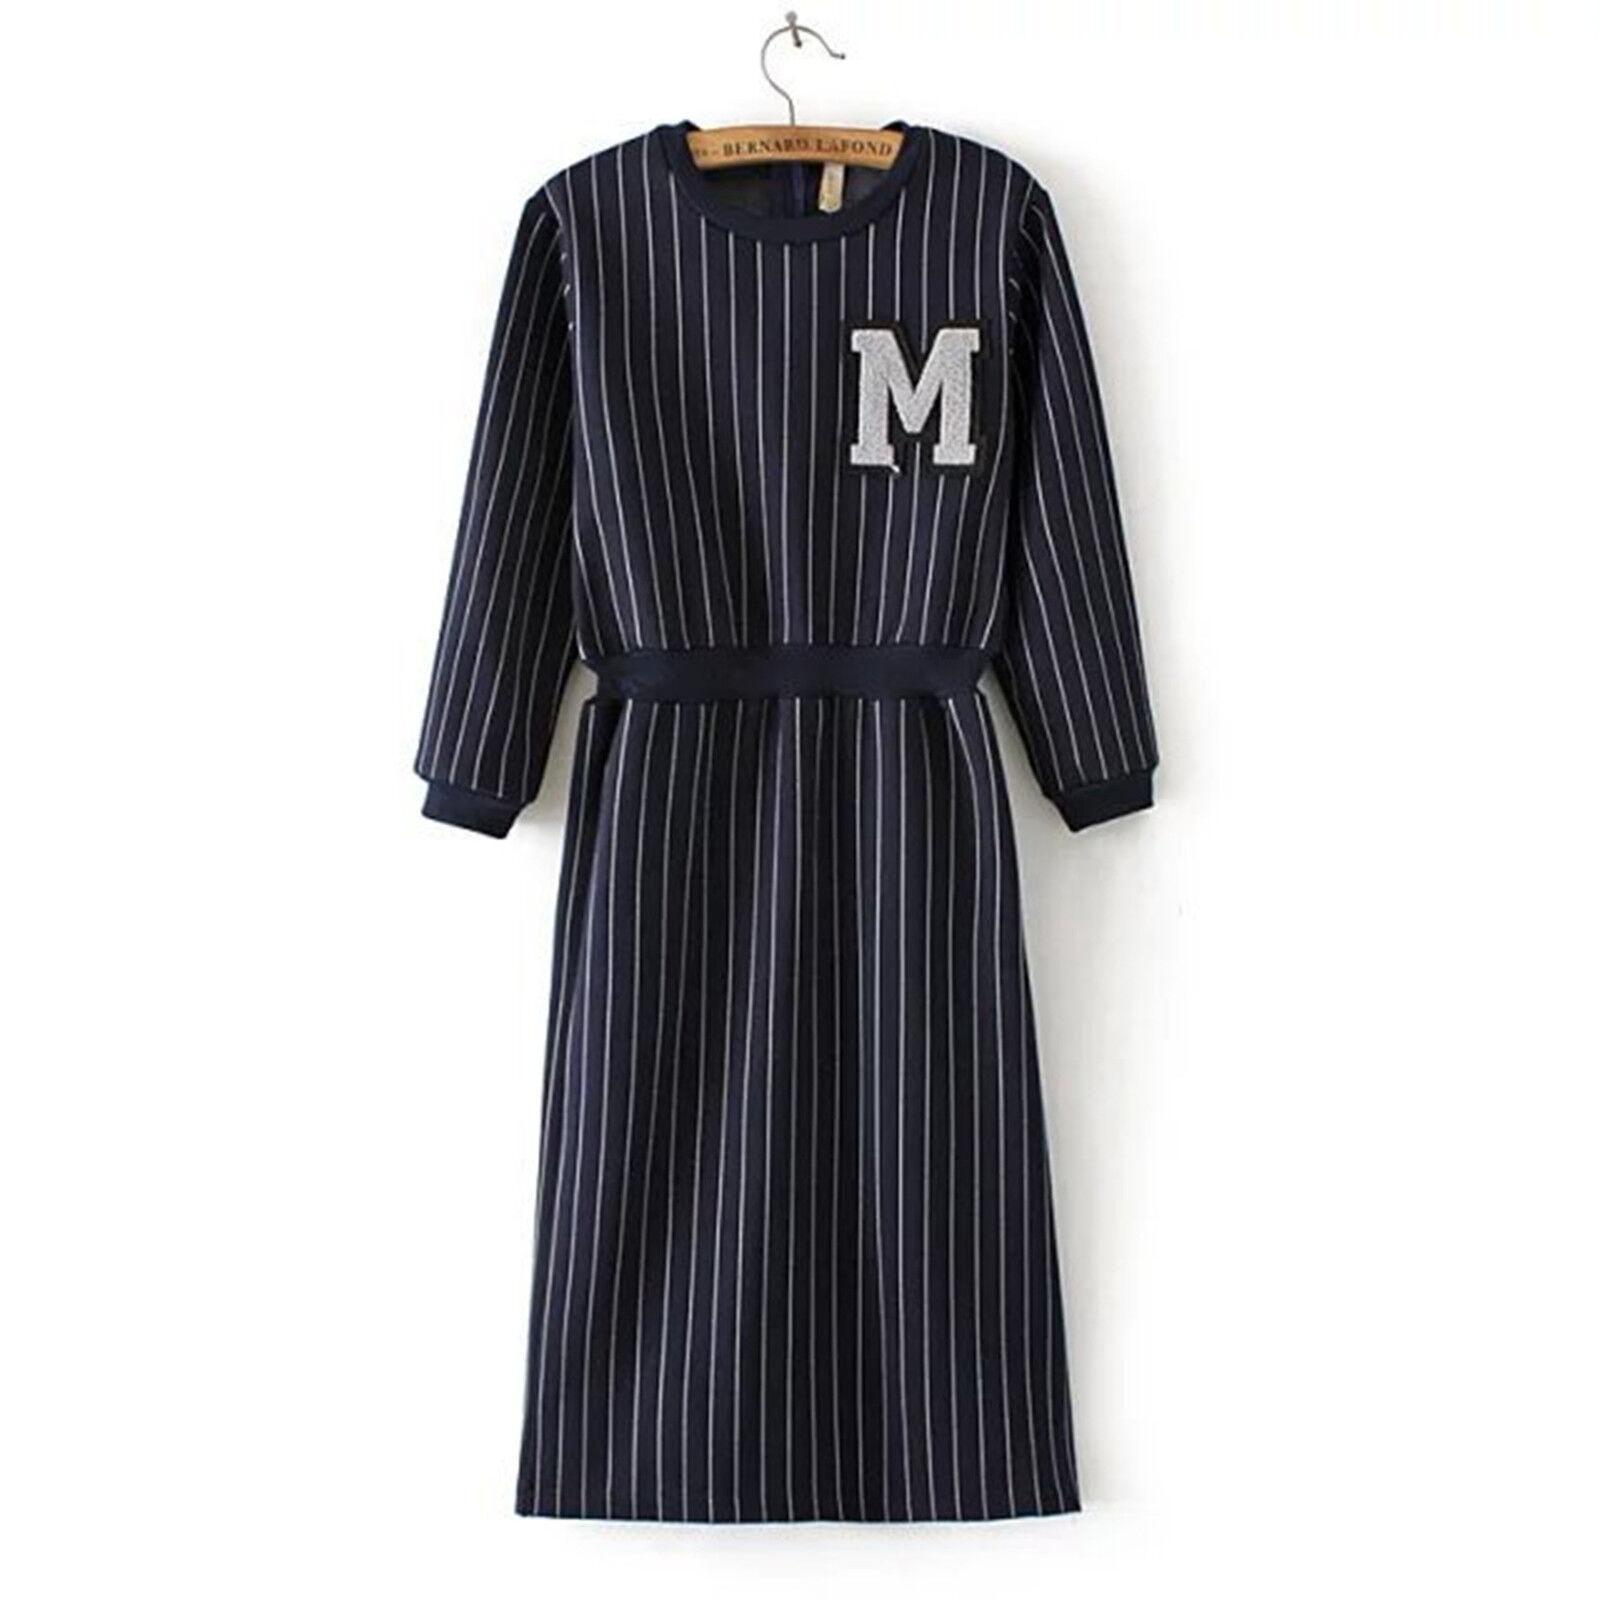 Women Lady Girl Striped M letter long sleeves Navy bluee Tunic Dress AUS 8